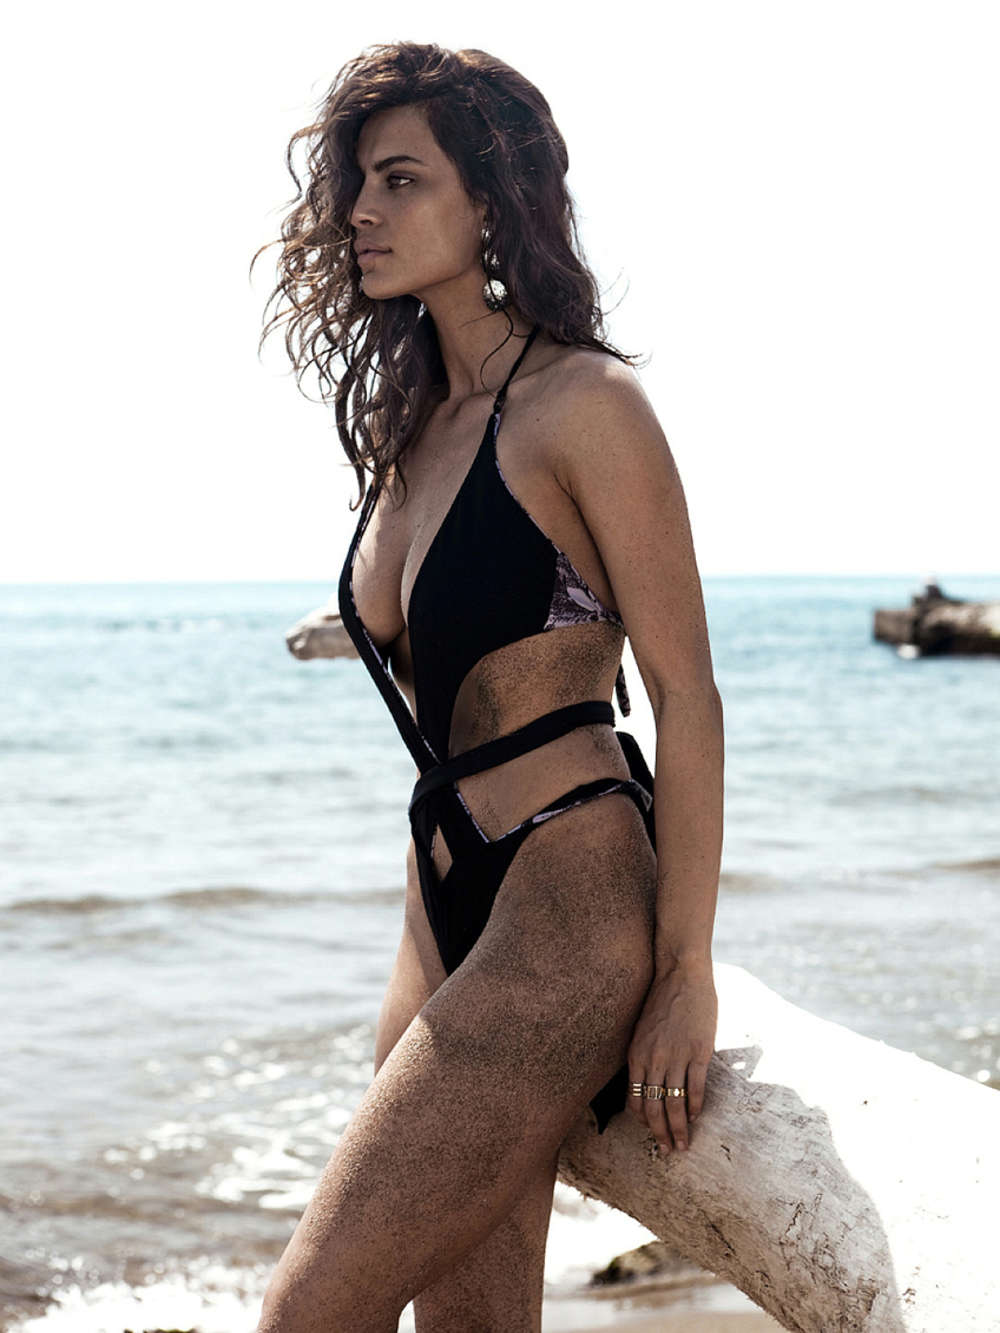 Bikini Catrinel Menghia naked (68 foto and video), Sexy, Sideboobs, Feet, cleavage 2019